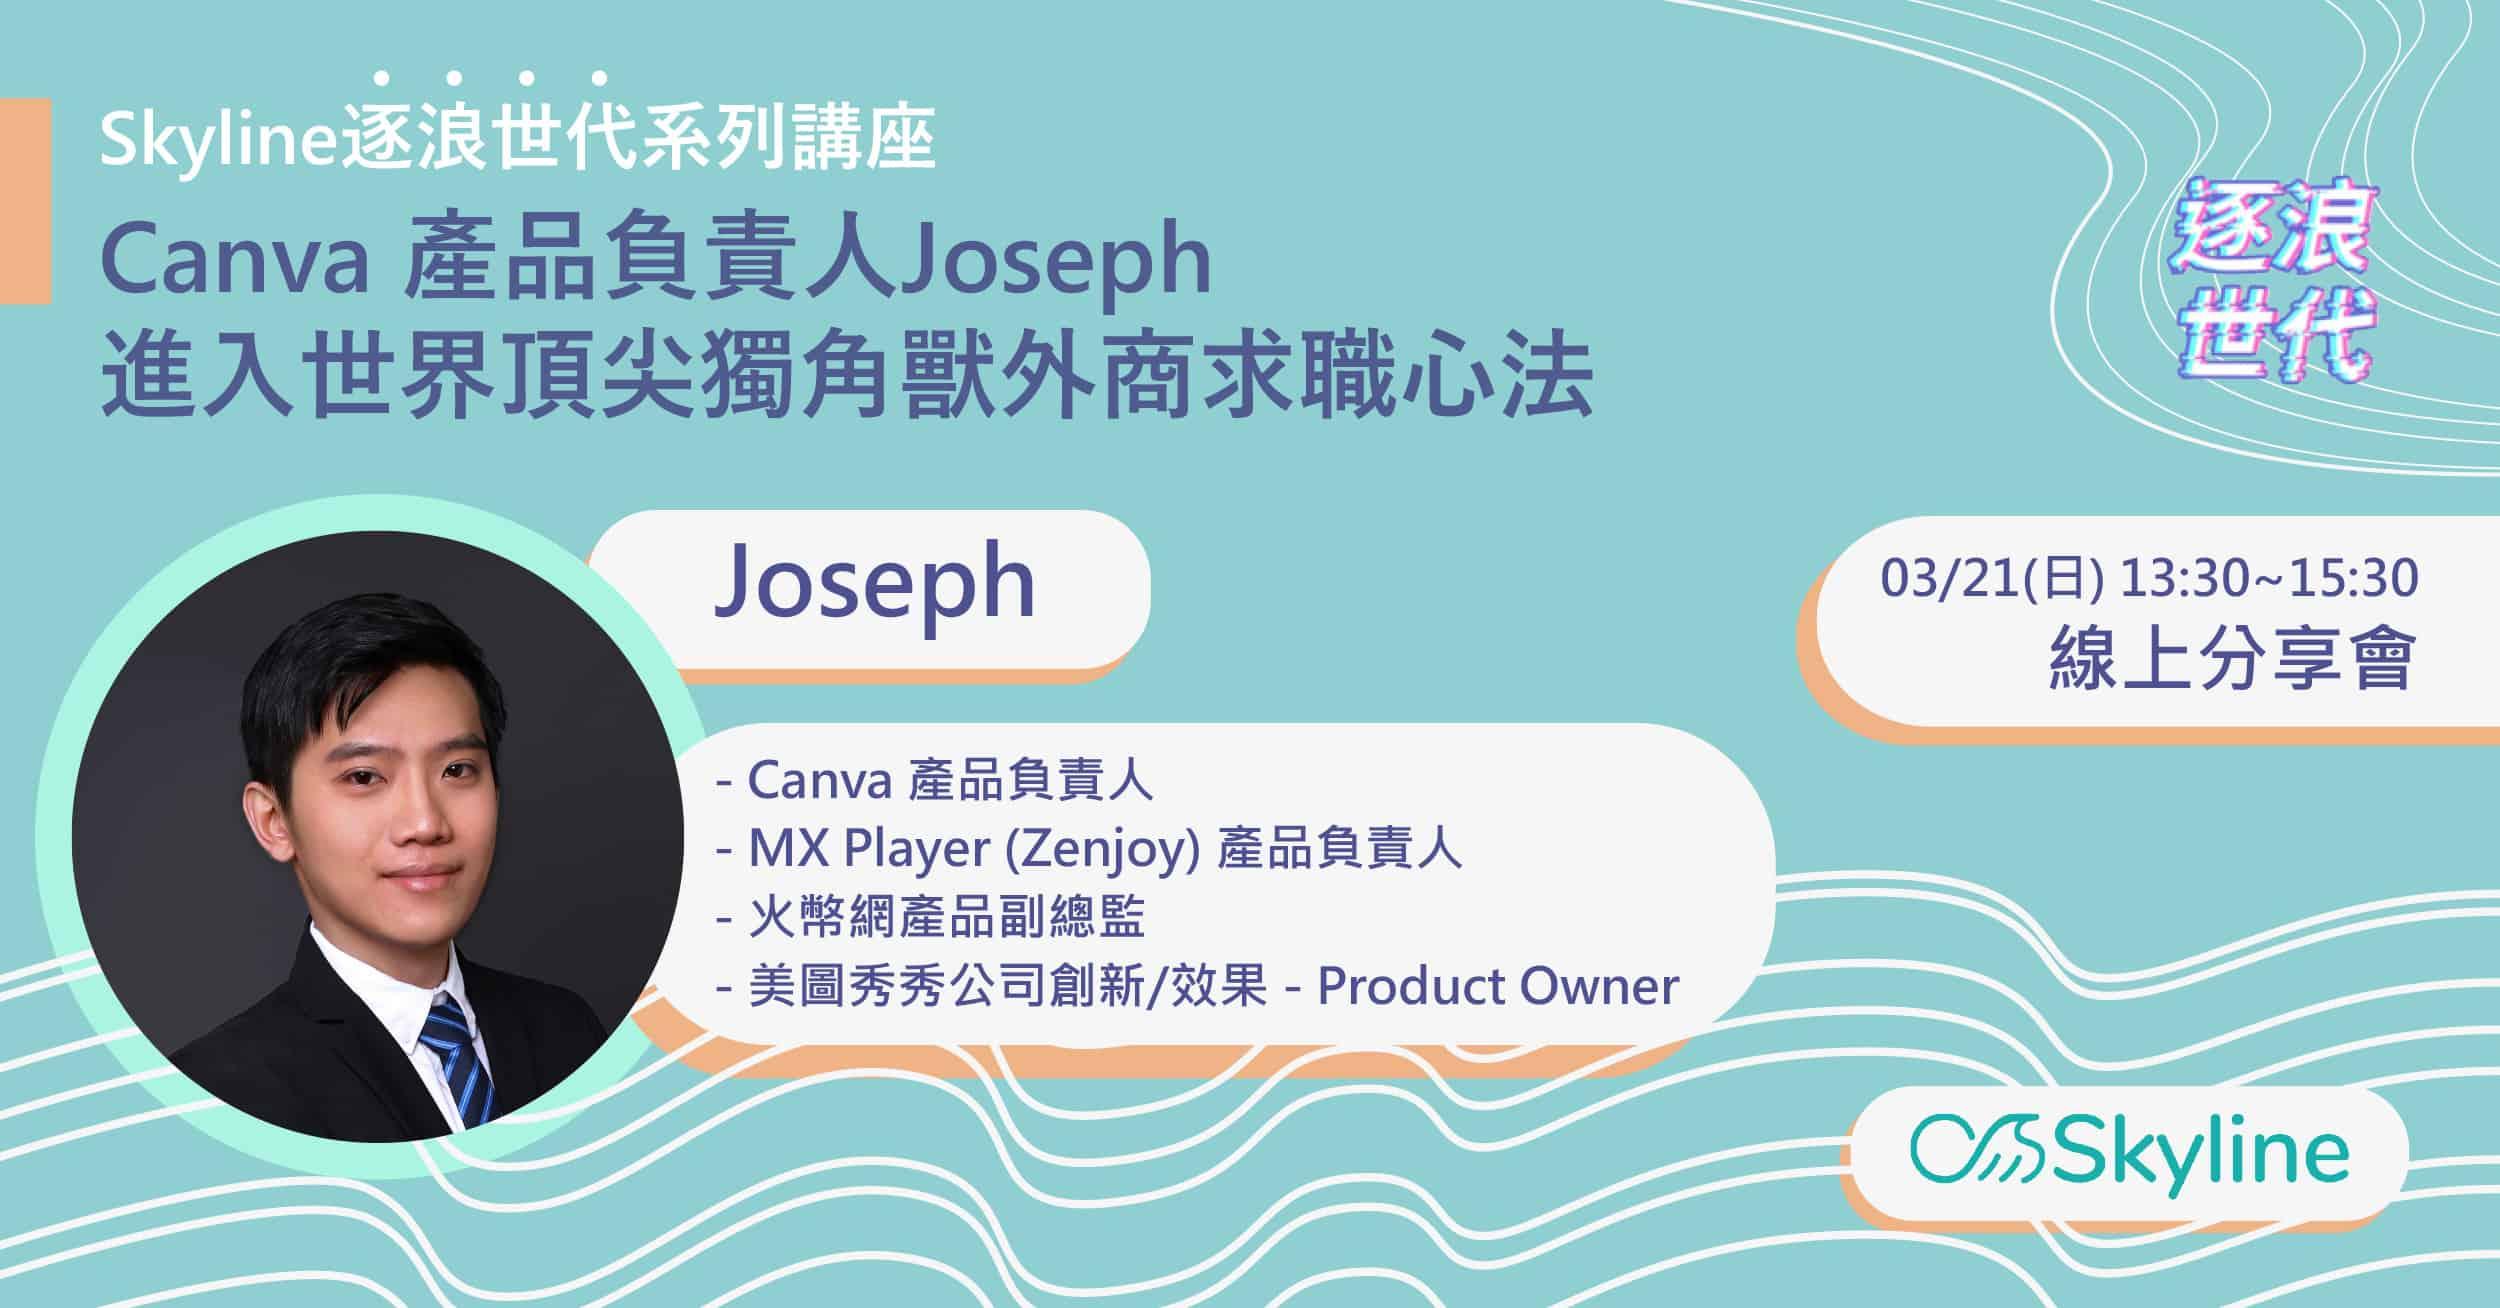 【Skyline 逐浪世代:Canva產品負責人Joseph】從工程師到產品經理,知名外商PM的跨界之路